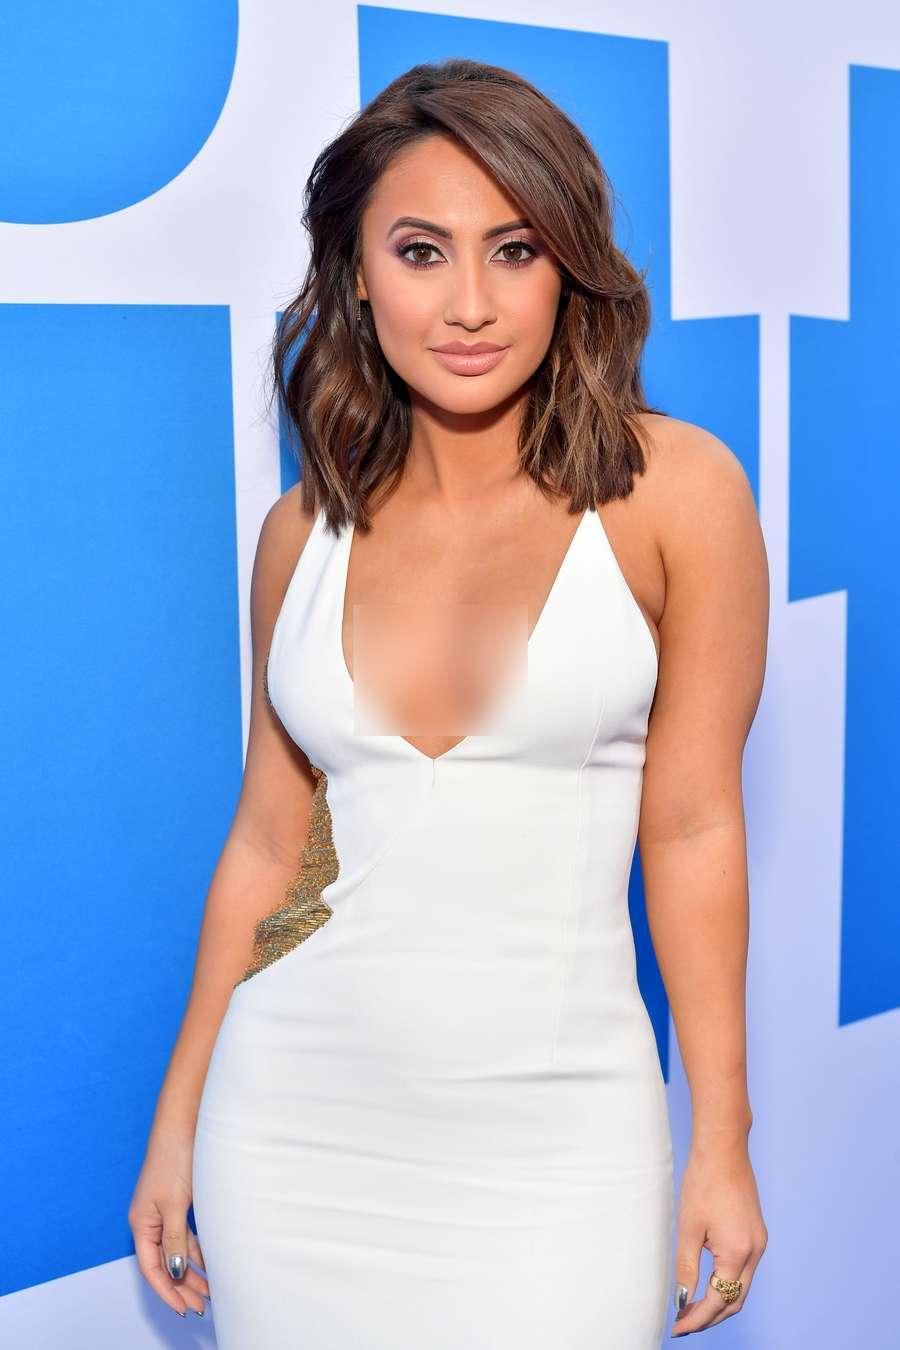 Ini Francia Raisa, Sahabat Selena Gomez